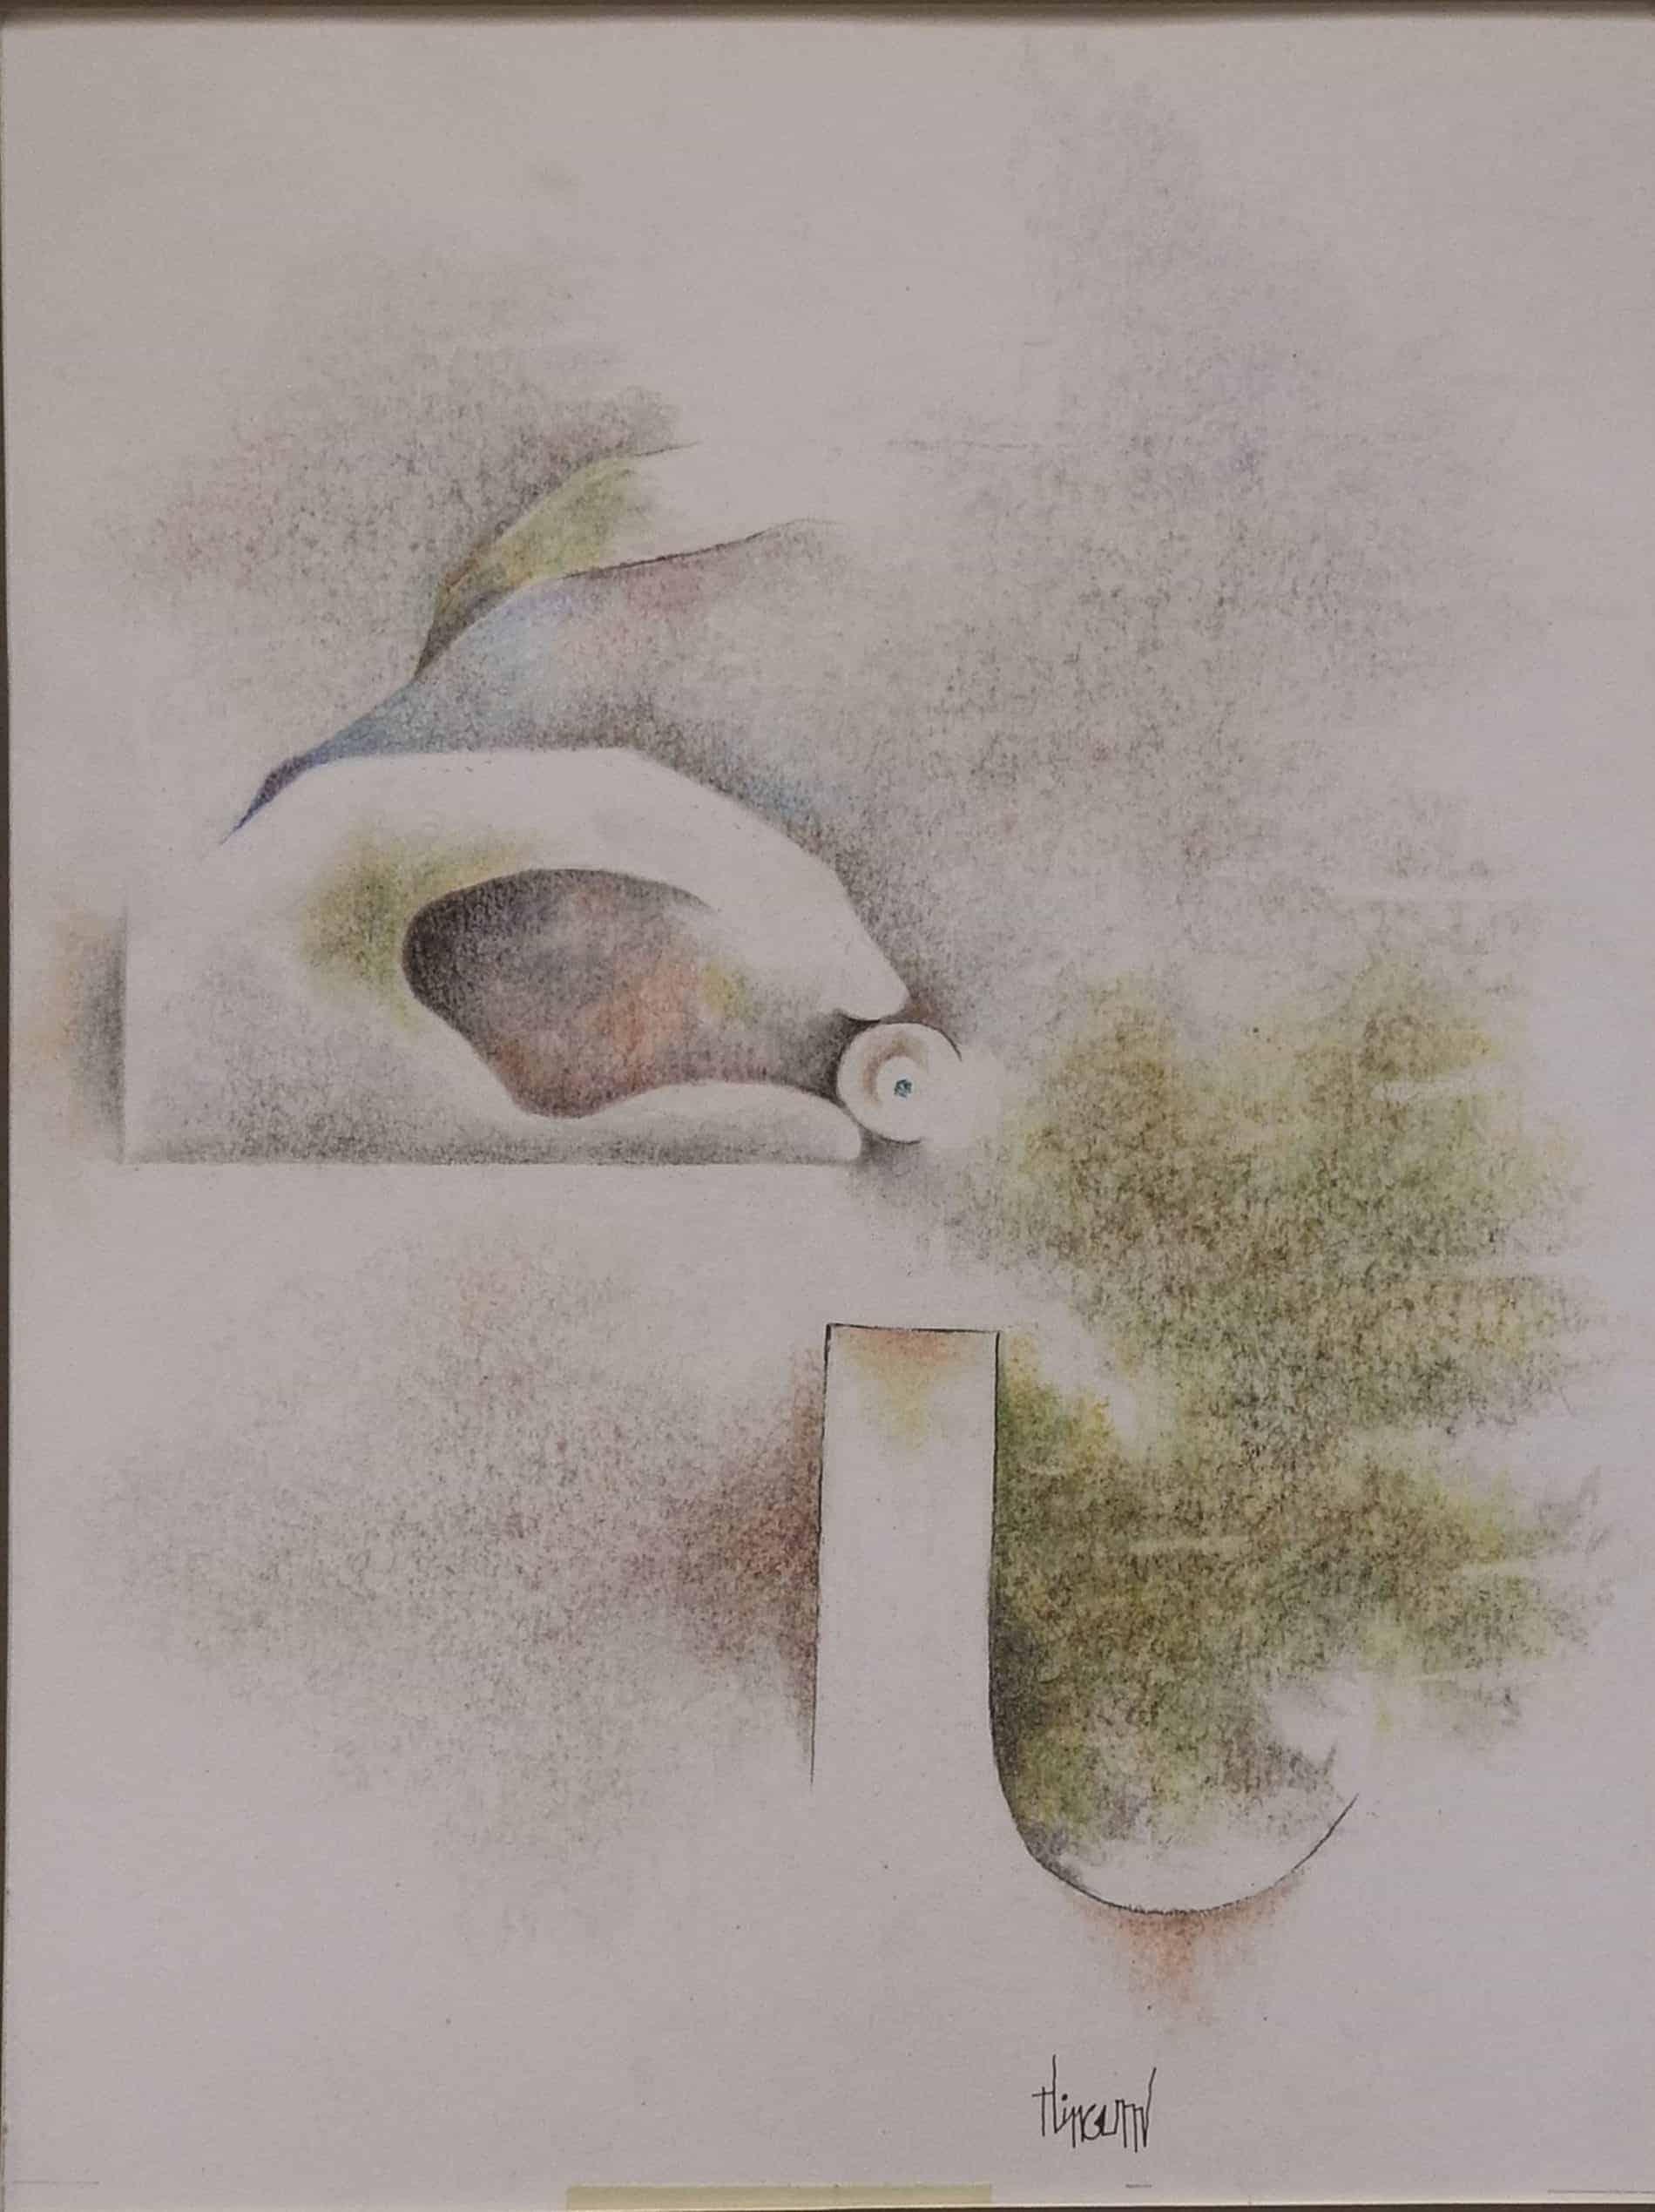 Mauritius Arts & Artists - moorthy-nagalingum-finalite